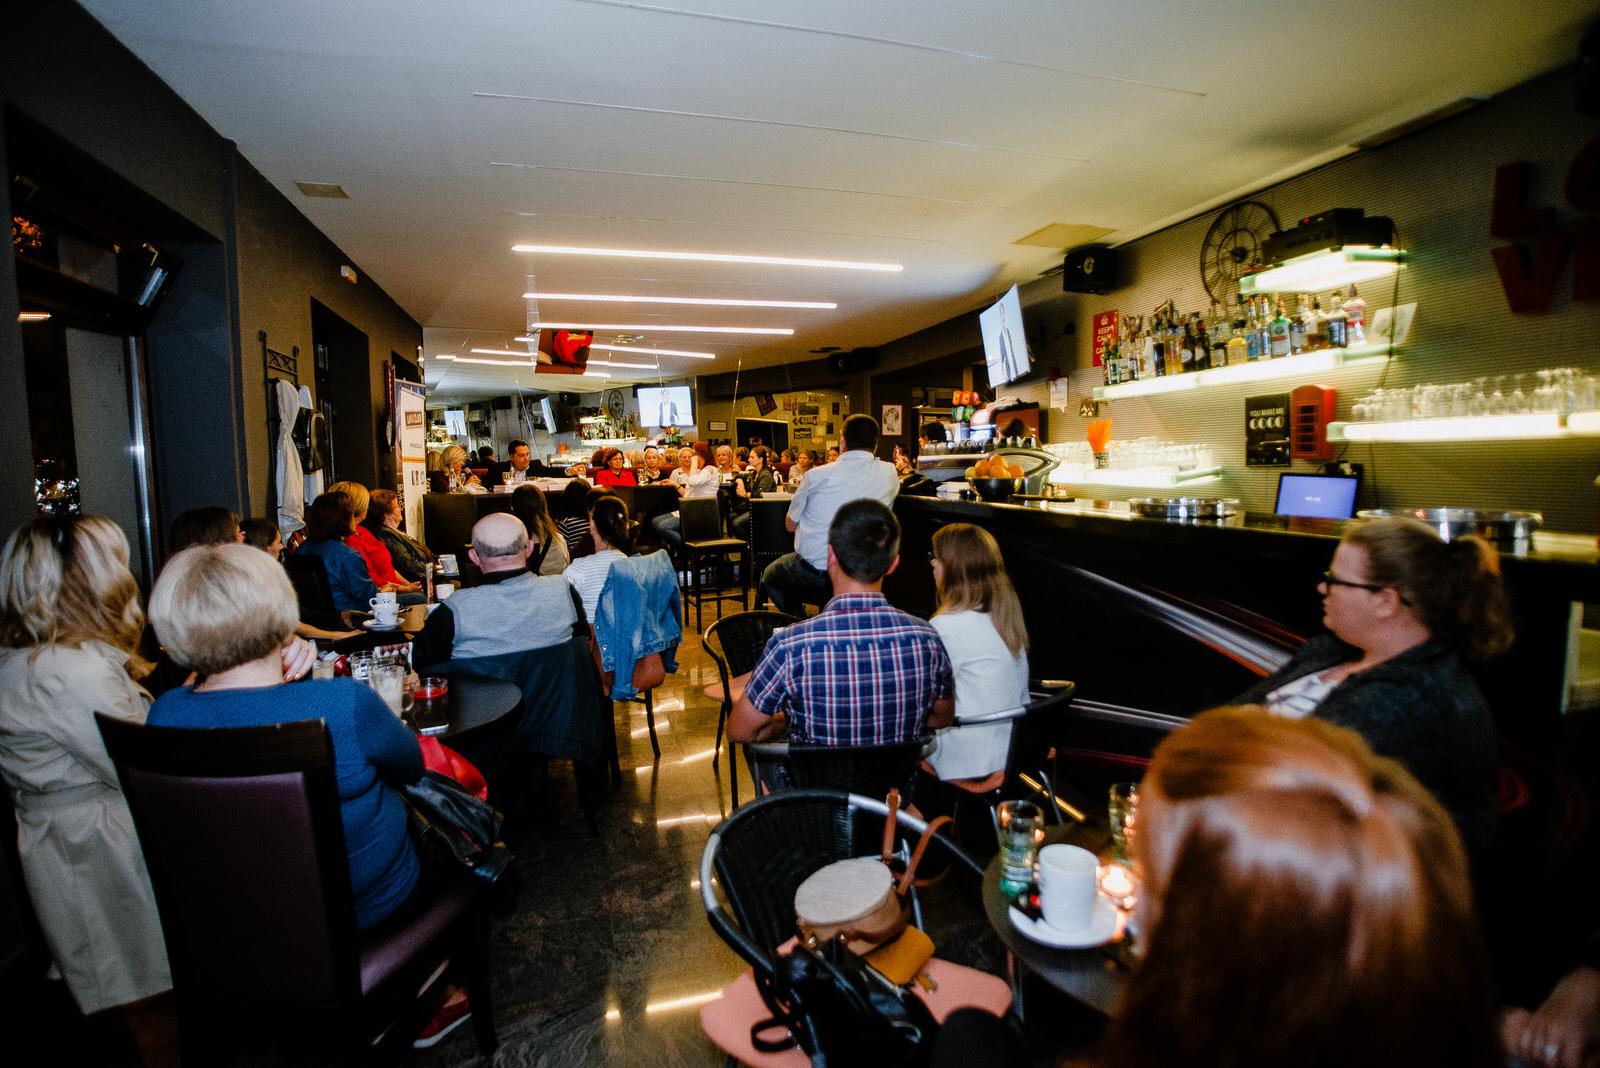 likaclub_otočac_book-caffe-paradisso_kenan-crnkić_2019-17